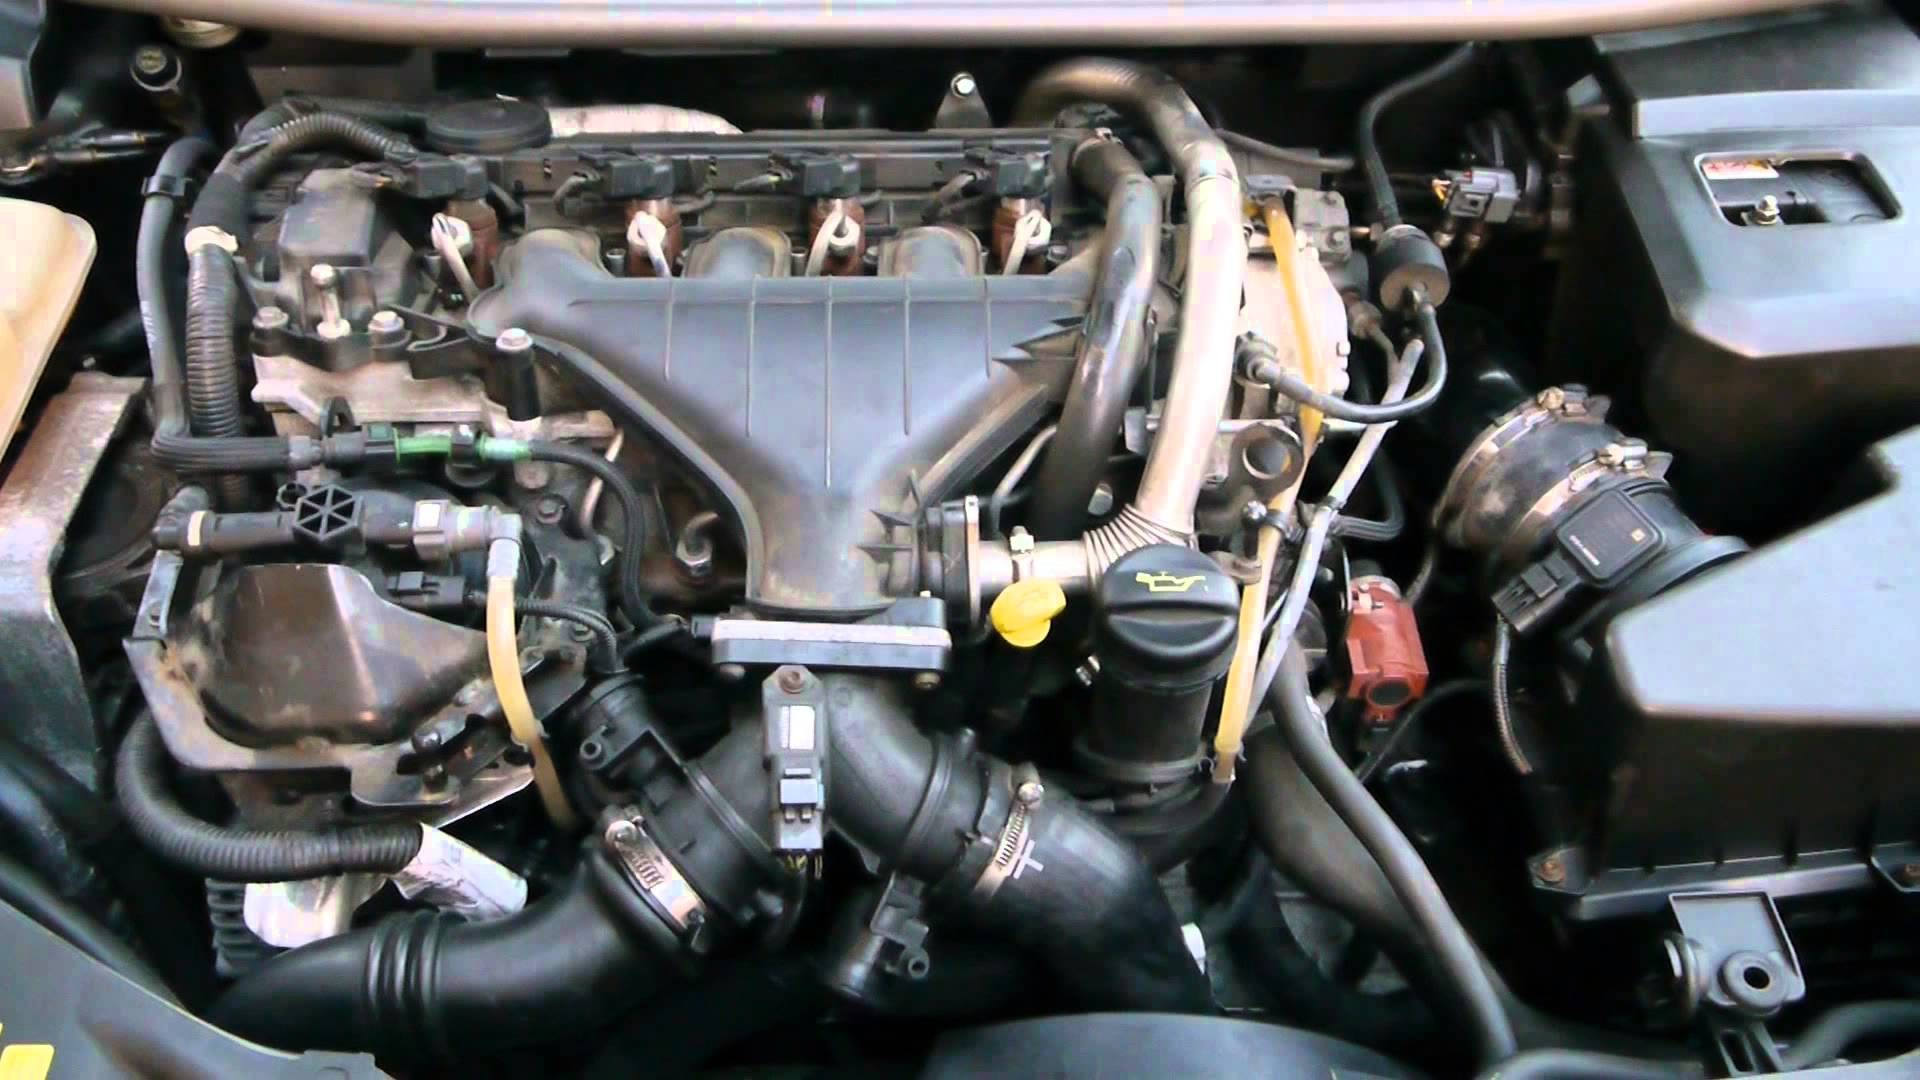 Volvo V40 Engine Diagram 2006 Saturn Radio Wiring Diagram In ...